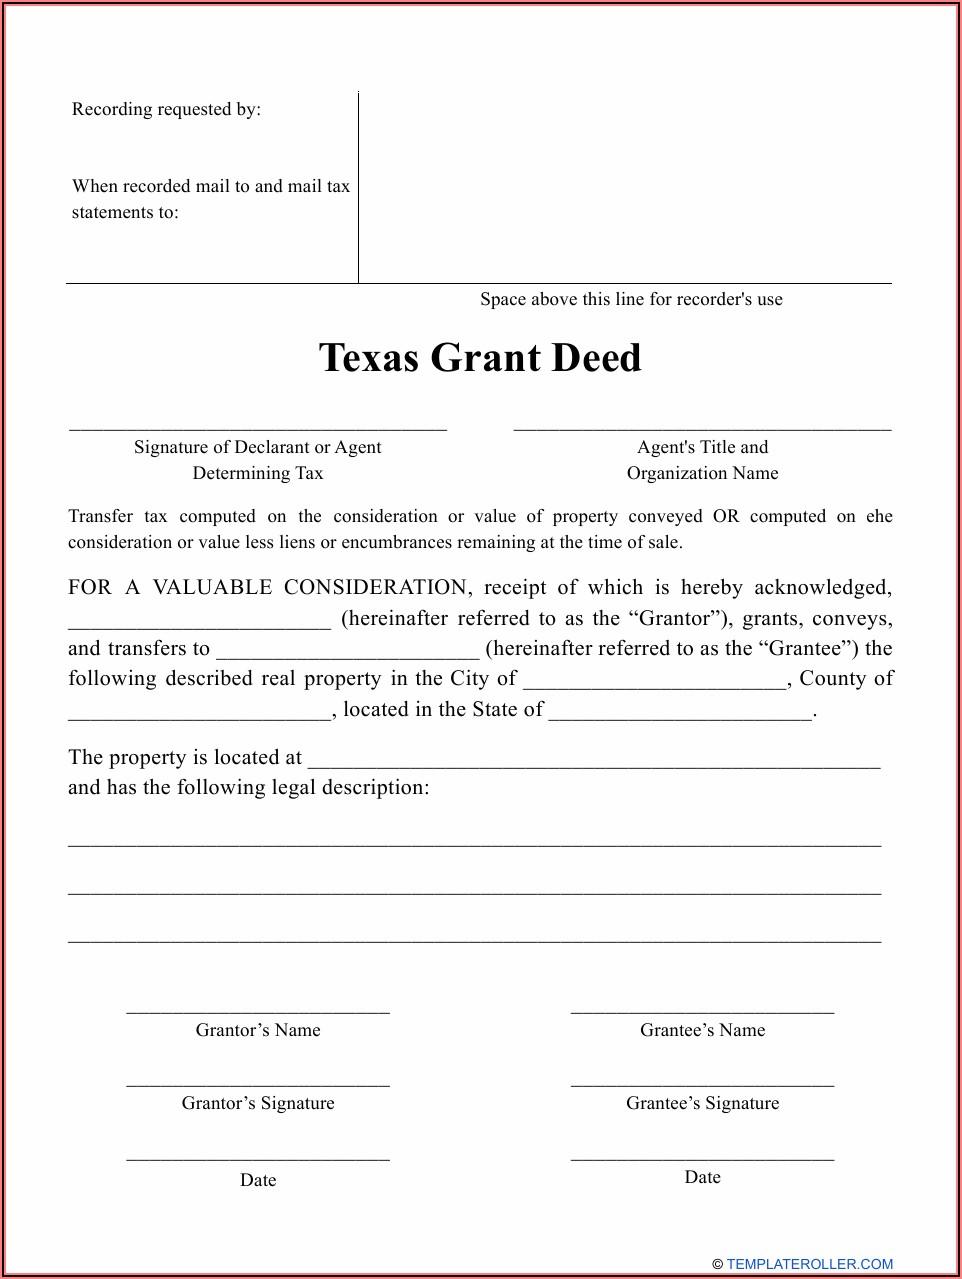 Grant Deed Form Texas